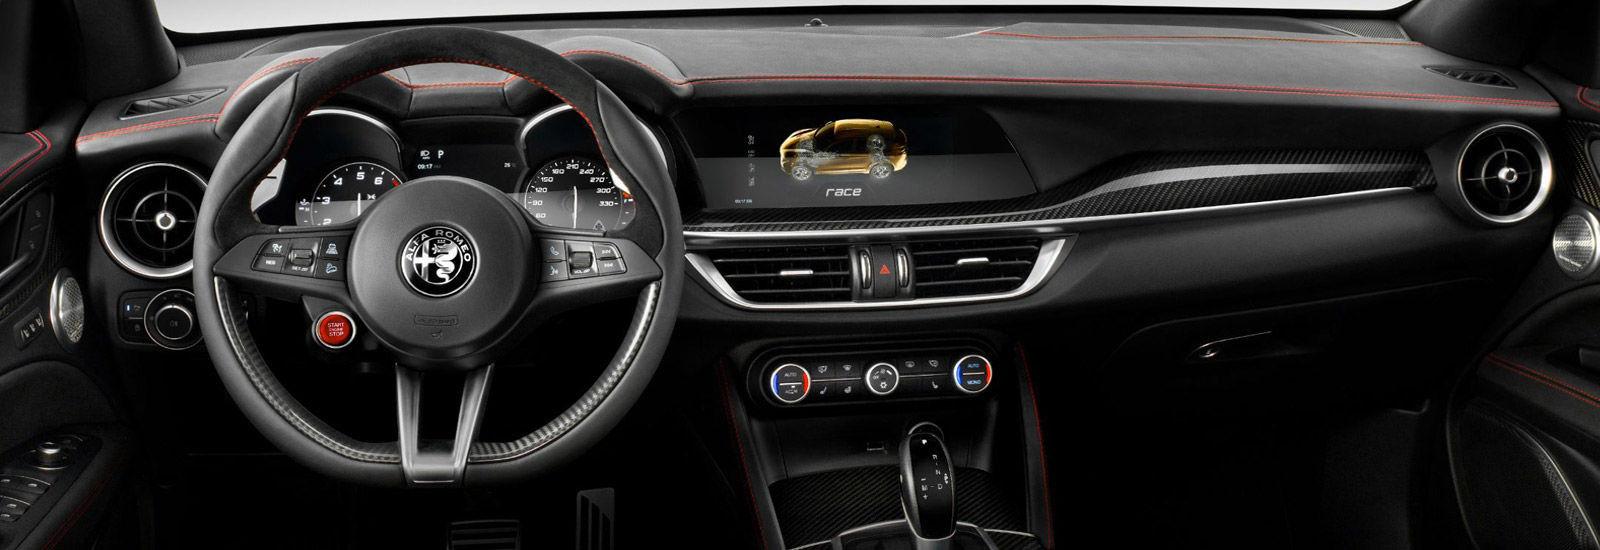 2017 Alfa Romeo Stelvio Suv Price Specs Release Date Carwow